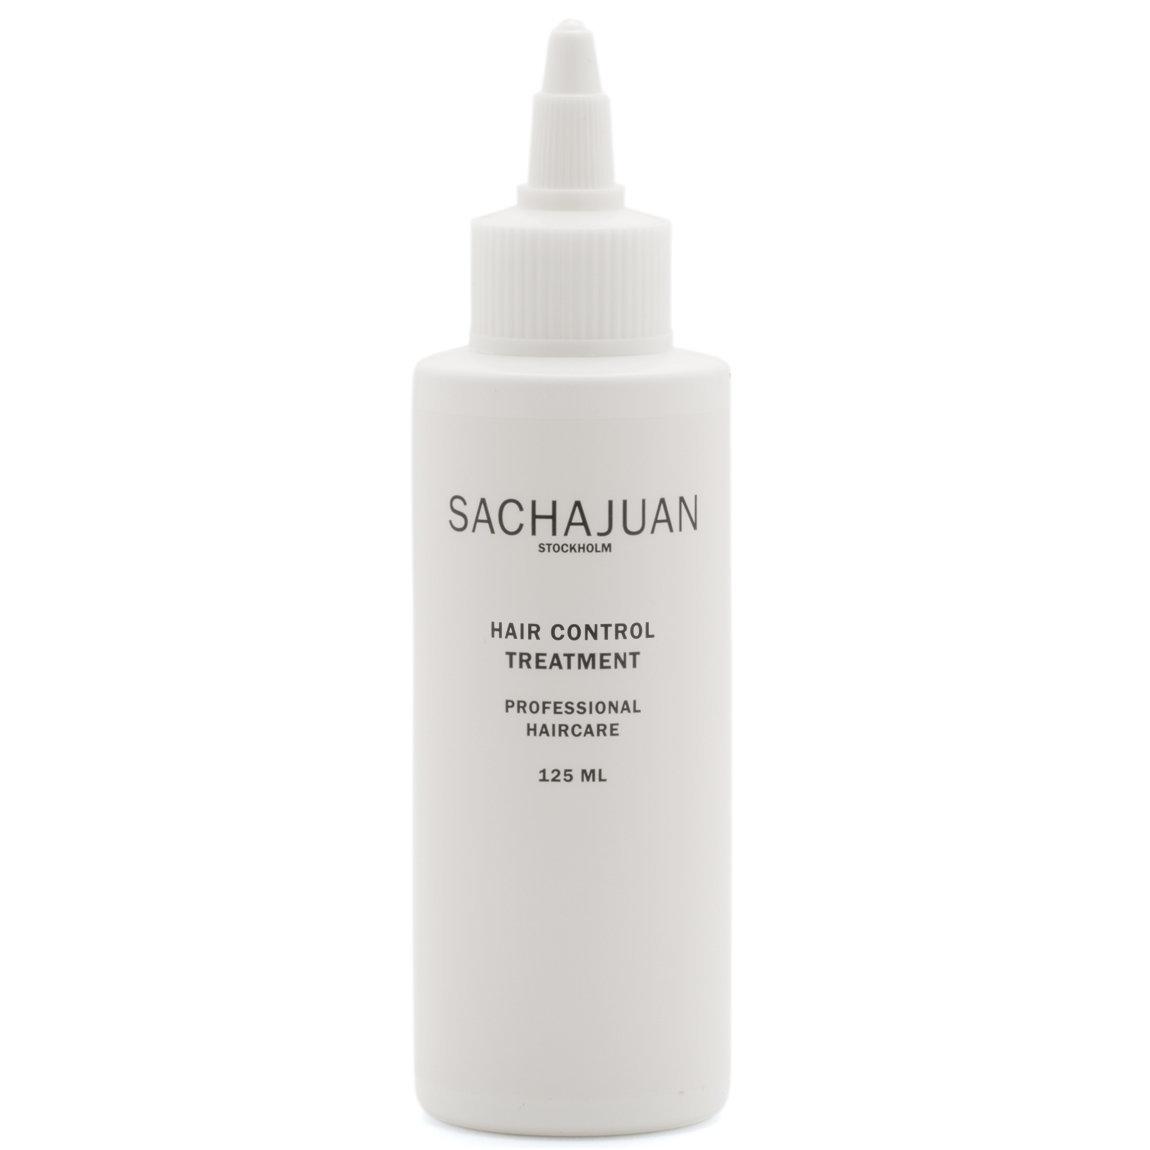 SACHAJUAN Hair Control Treatment alternative view 1 - product swatch.